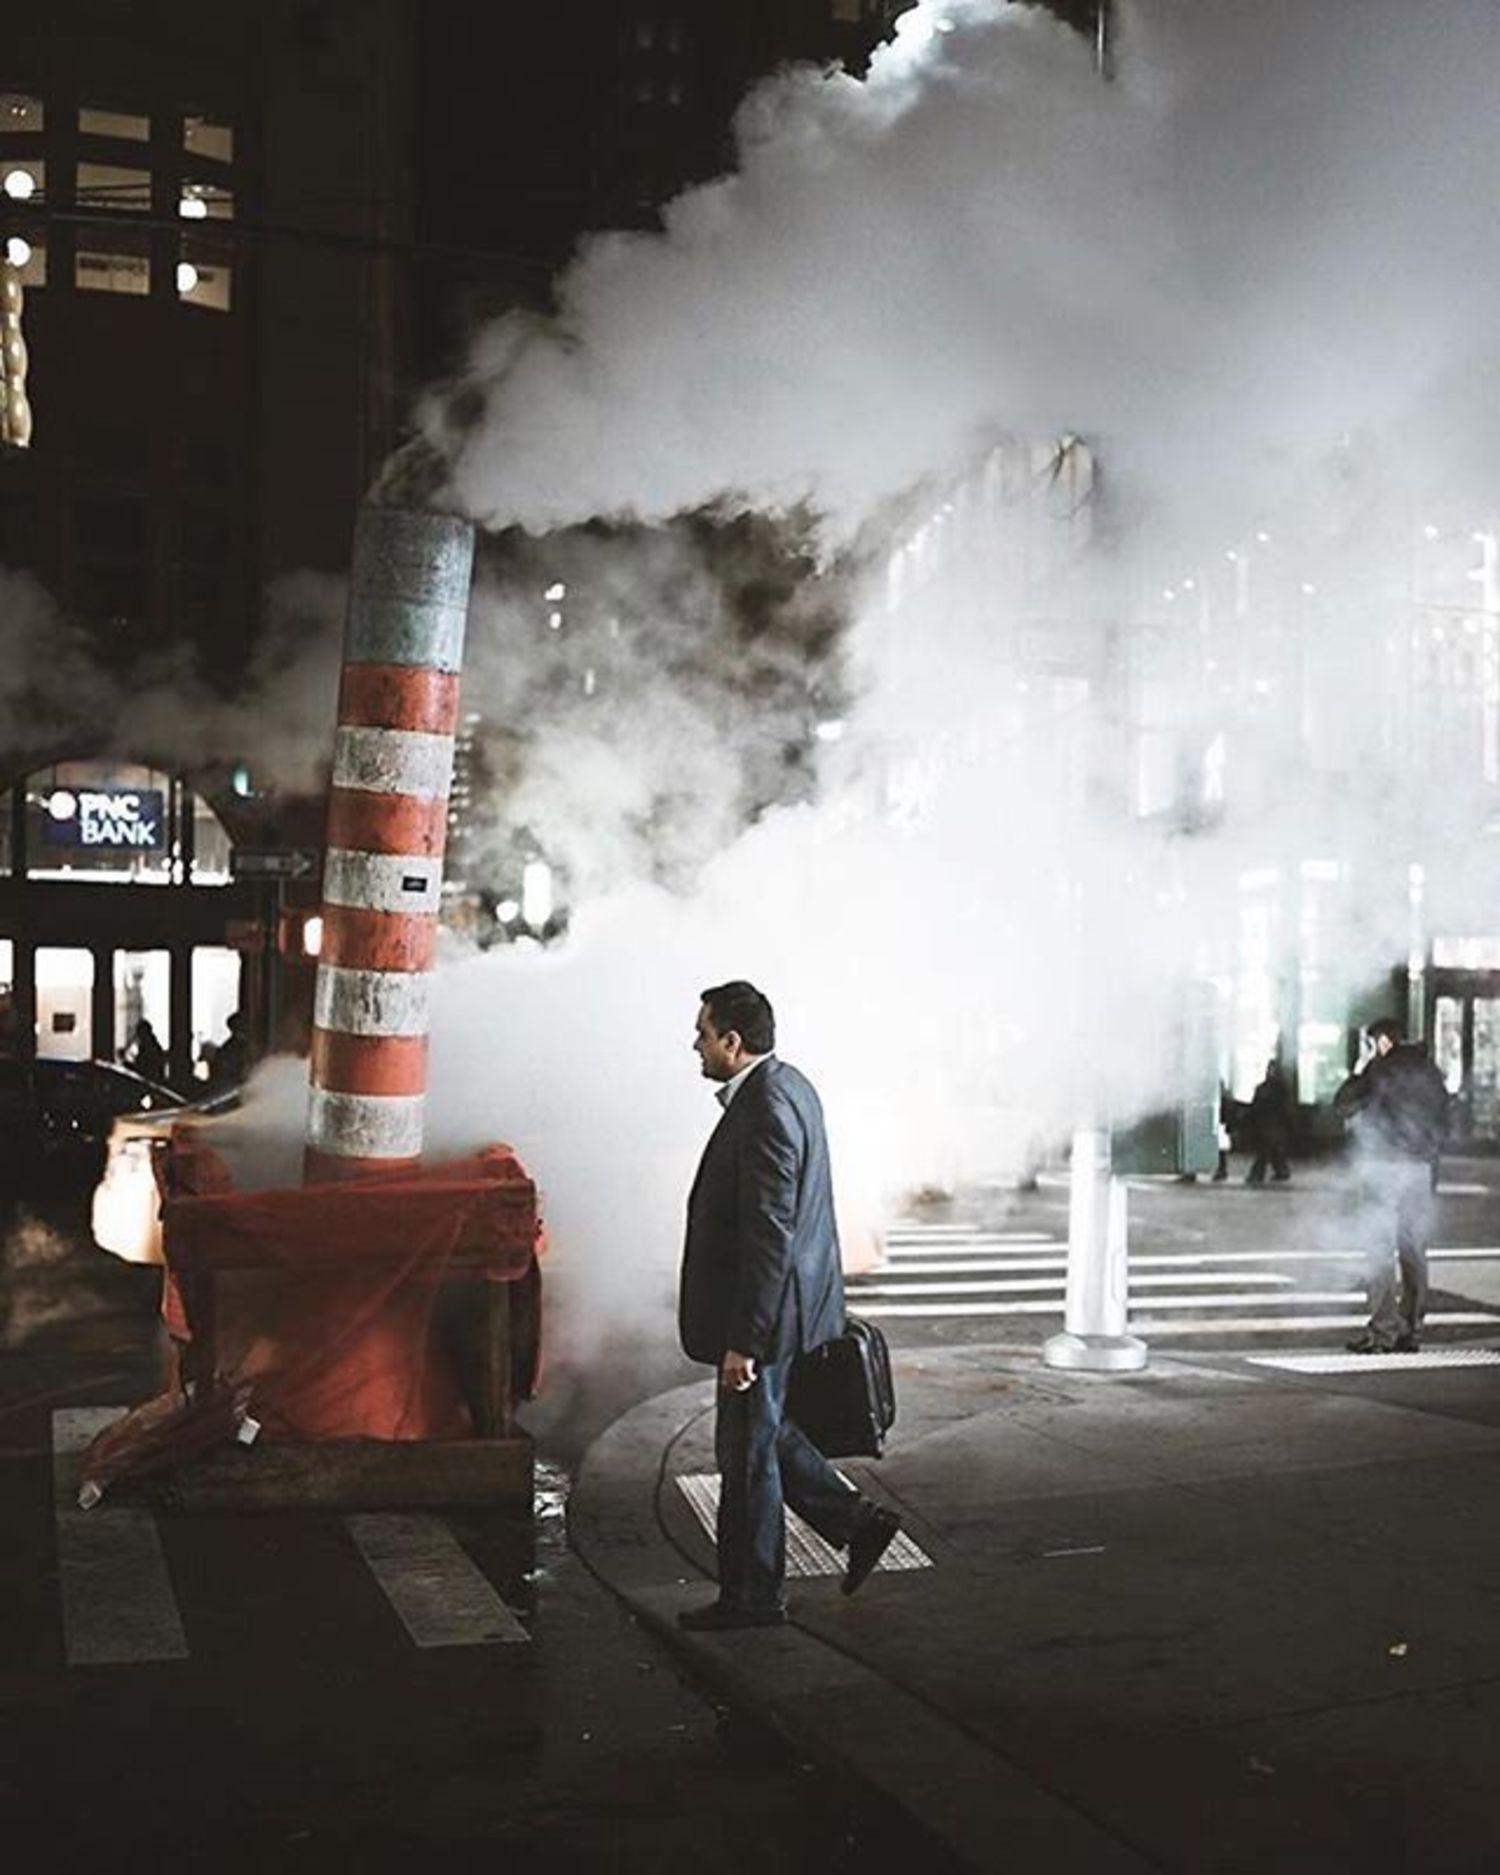 New York, New York. Photo via @arin.nyc #viewingnyc #newyork #newyorkcity #nyc #steam #streetphotography